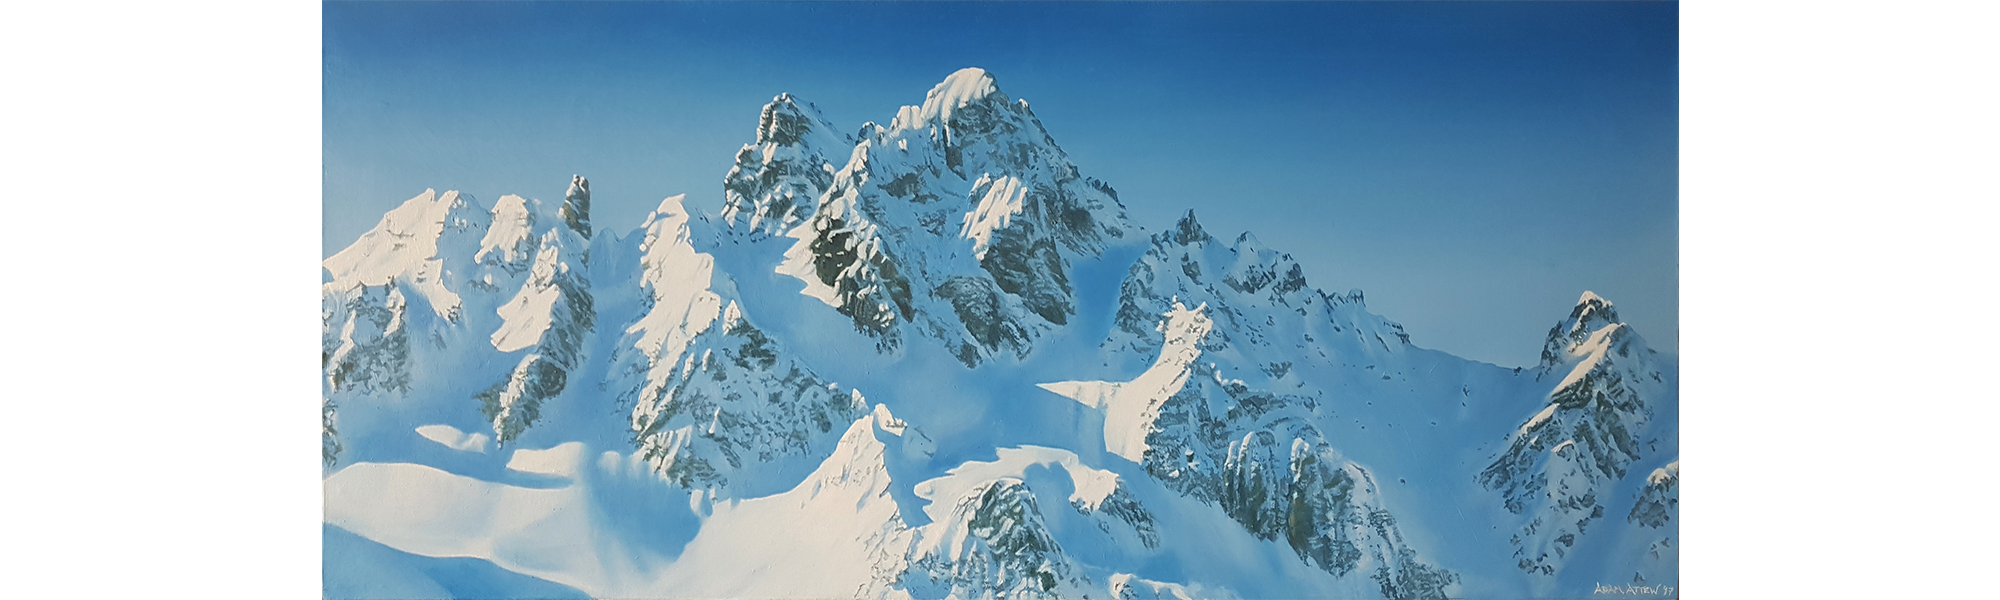 Courchevel France Attew Painting Landscape artist art ski snowboard mountain winter Snow Alpine Alps Montagne Alpes